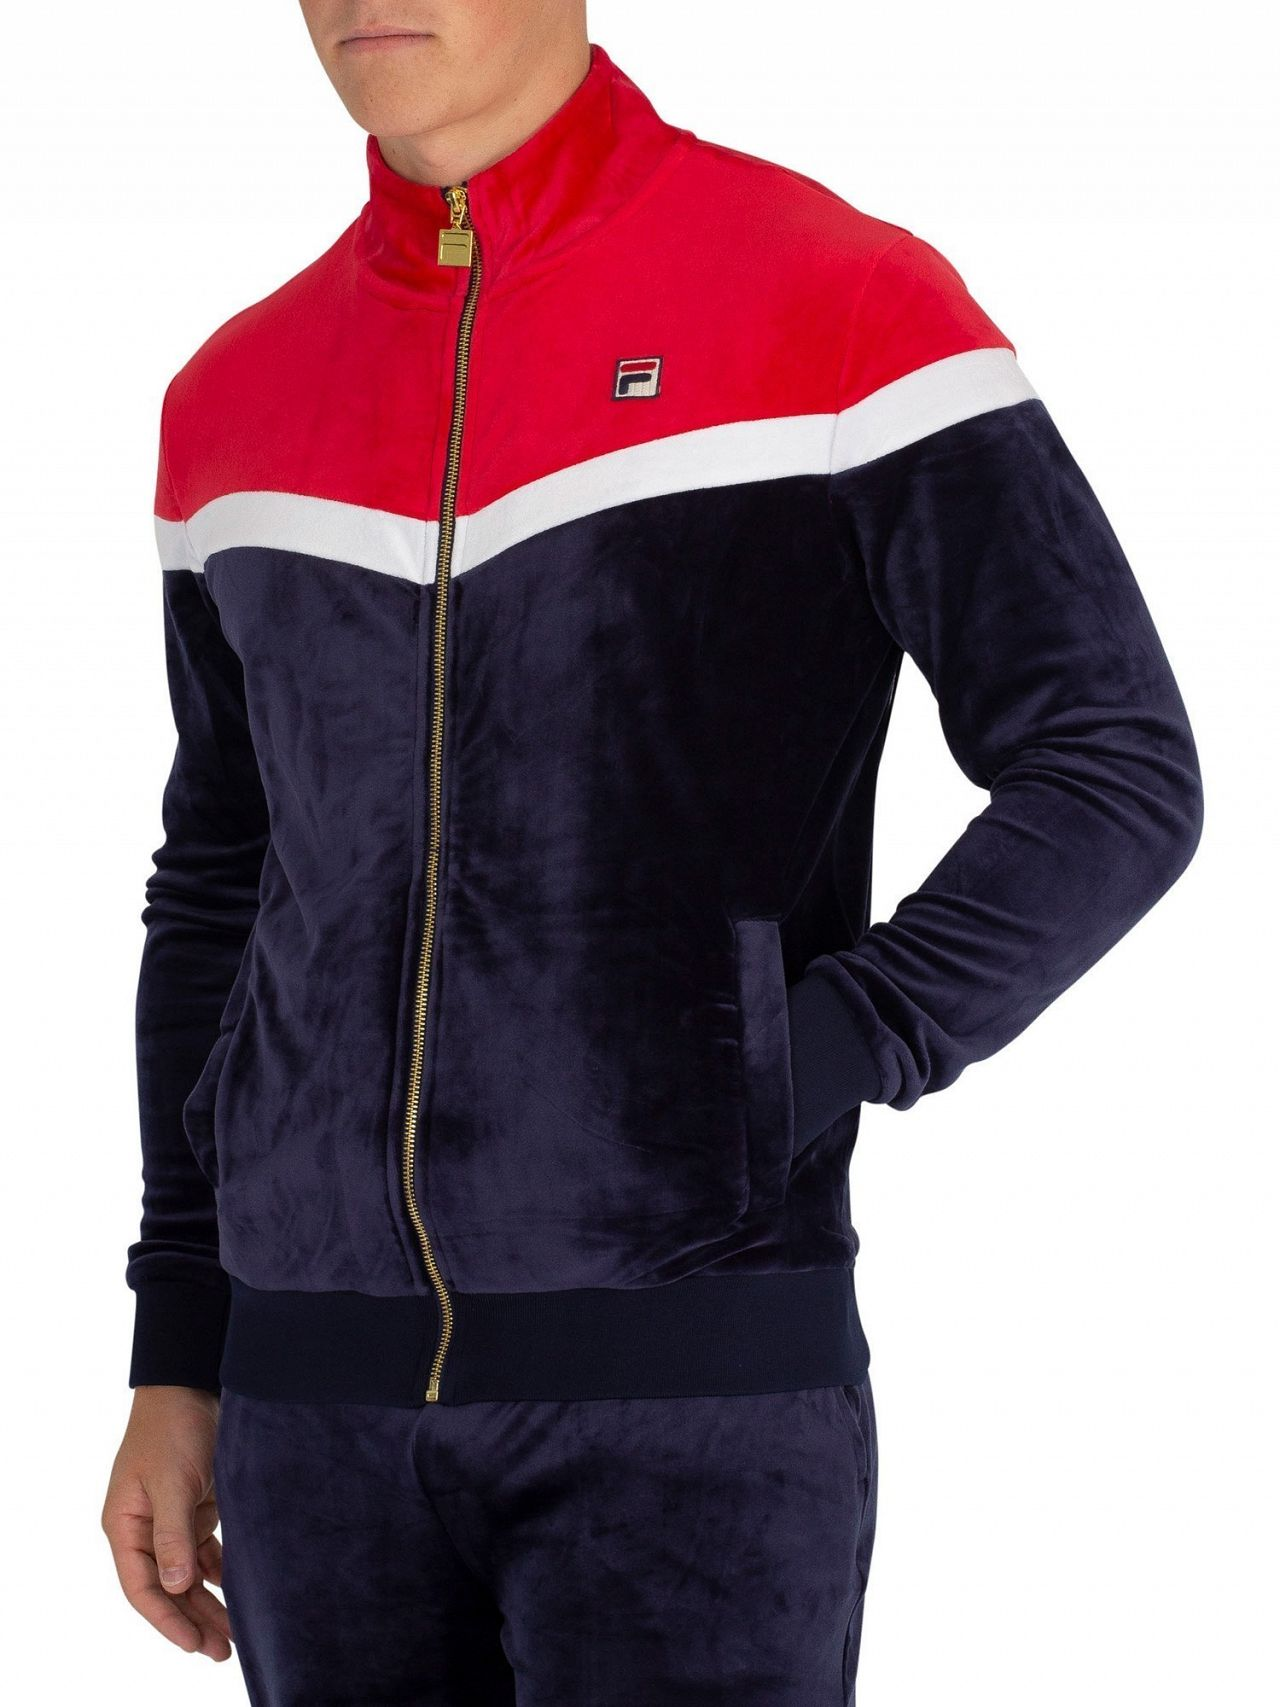 72215350 Fila Peacoat/White Harry Vintage Style Track Jacket   Standout